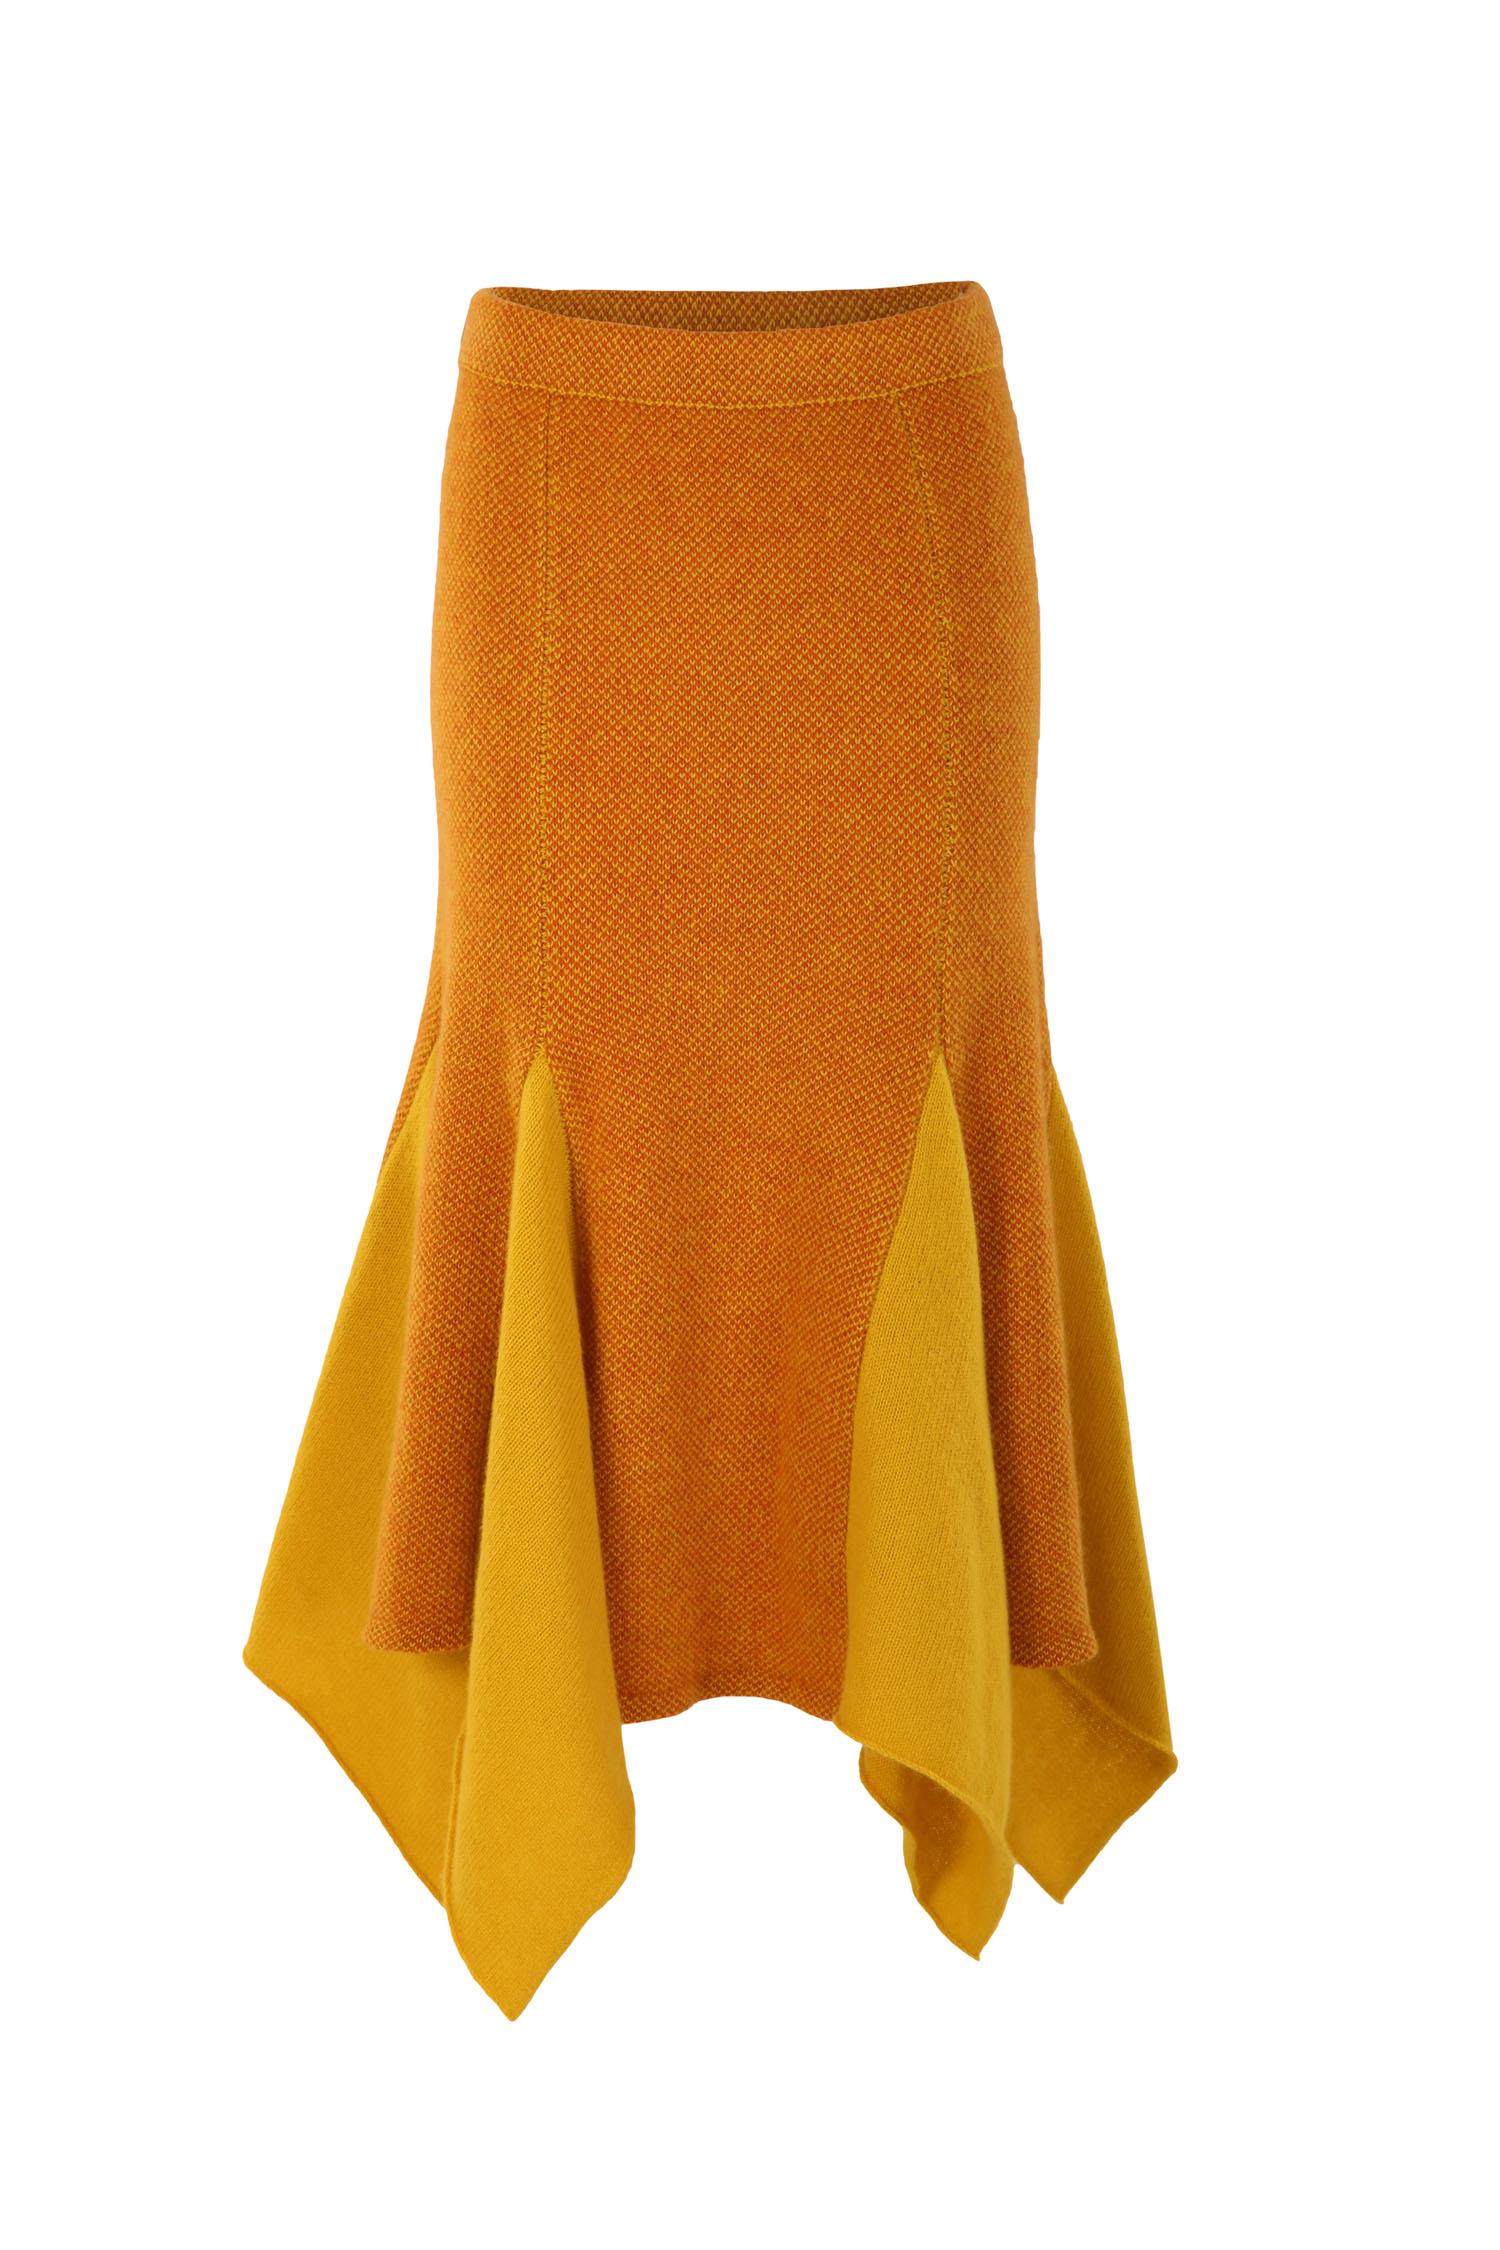 Ochre tweed skirt3